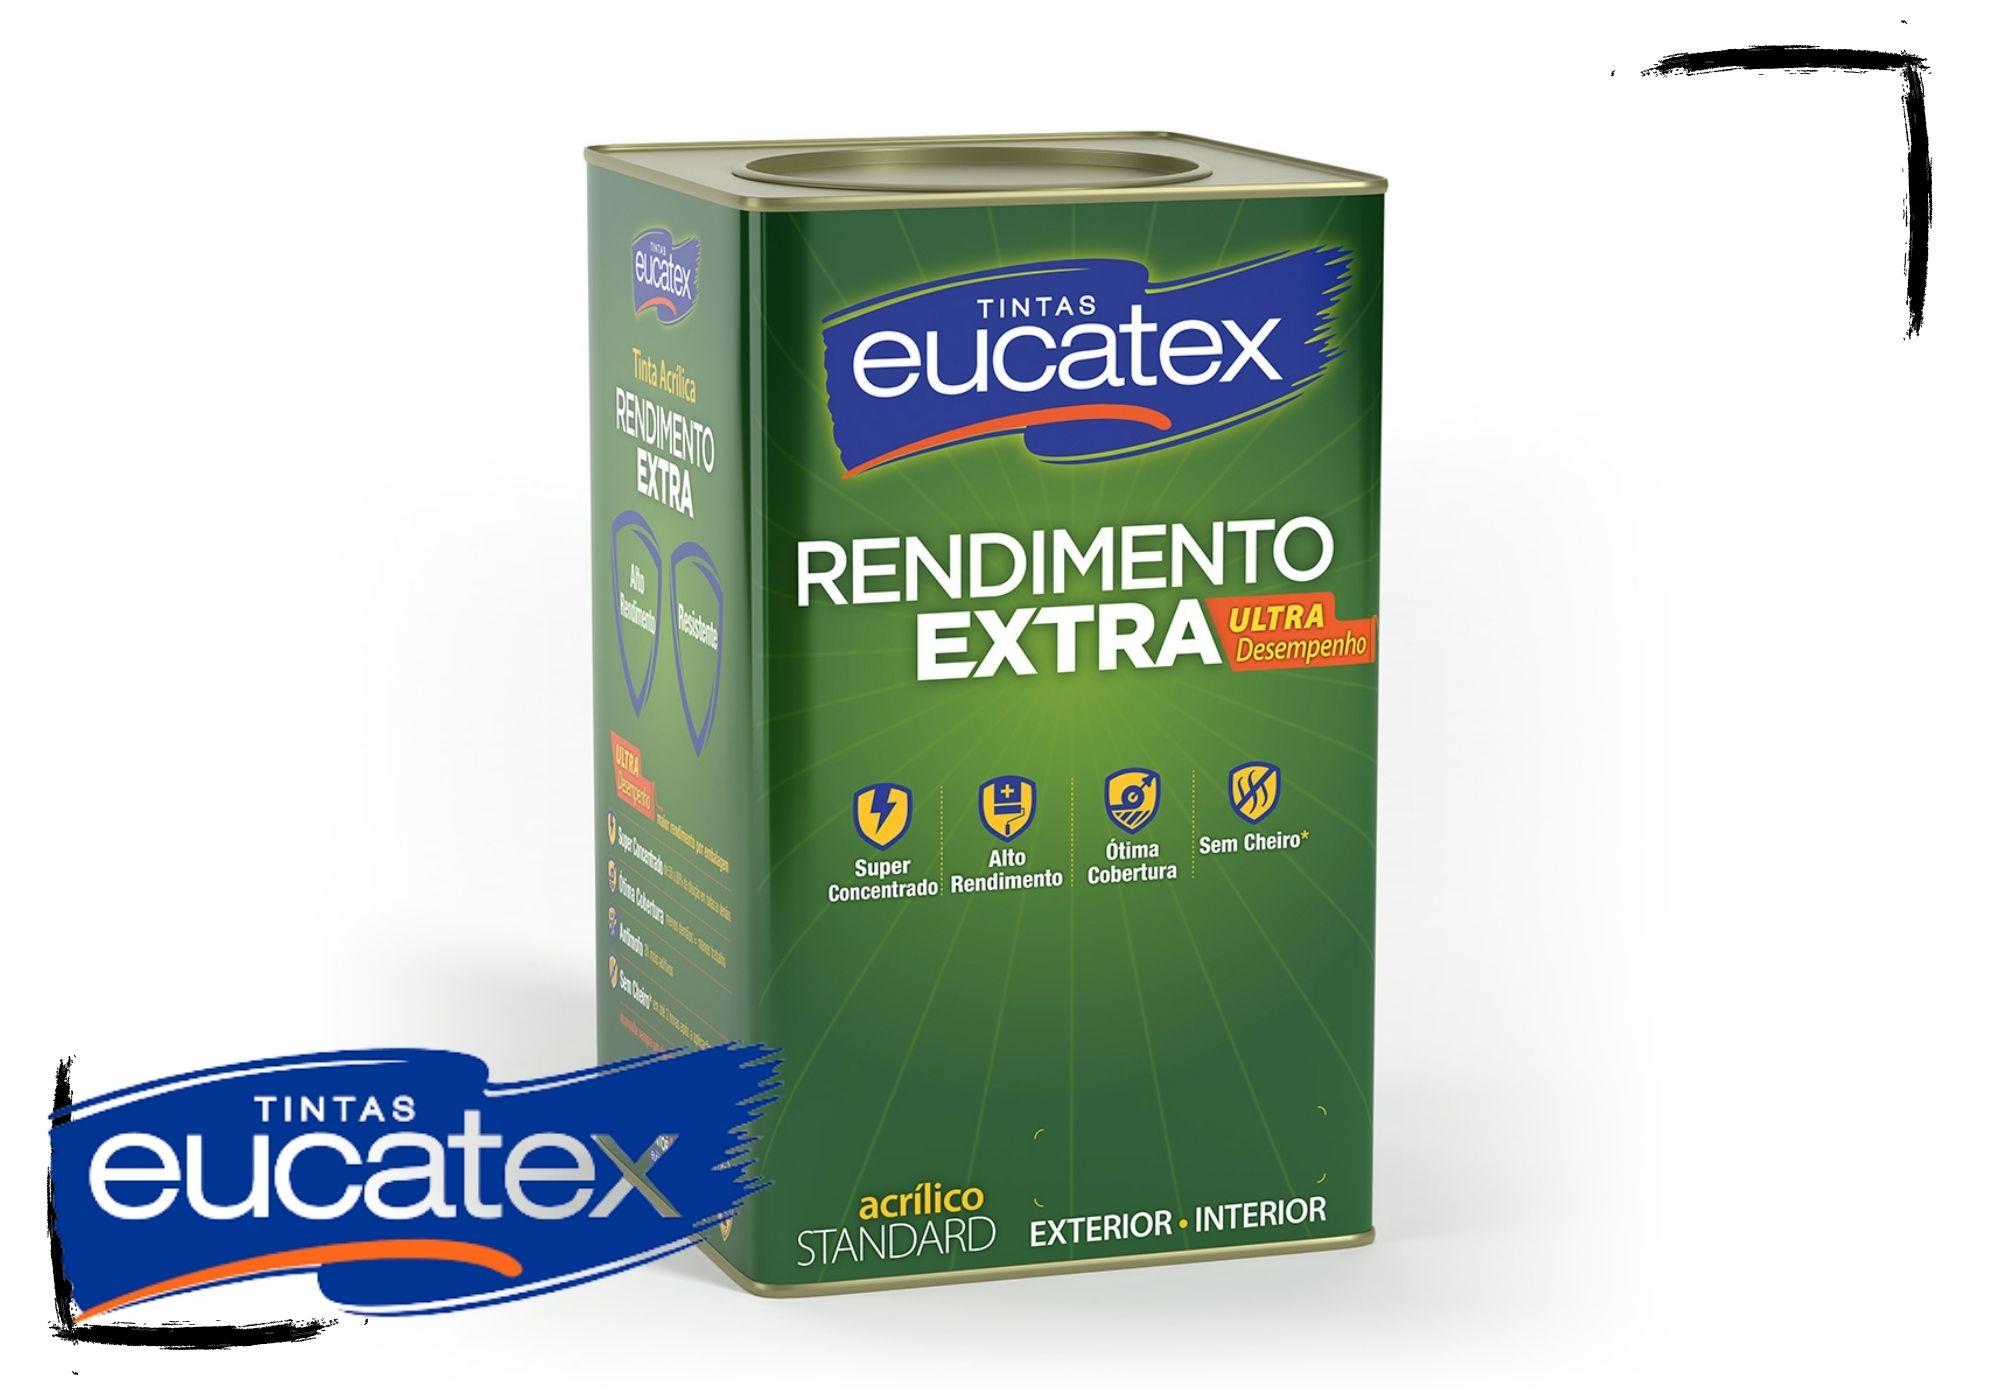 Eucatex Rendimento Extra 18L*